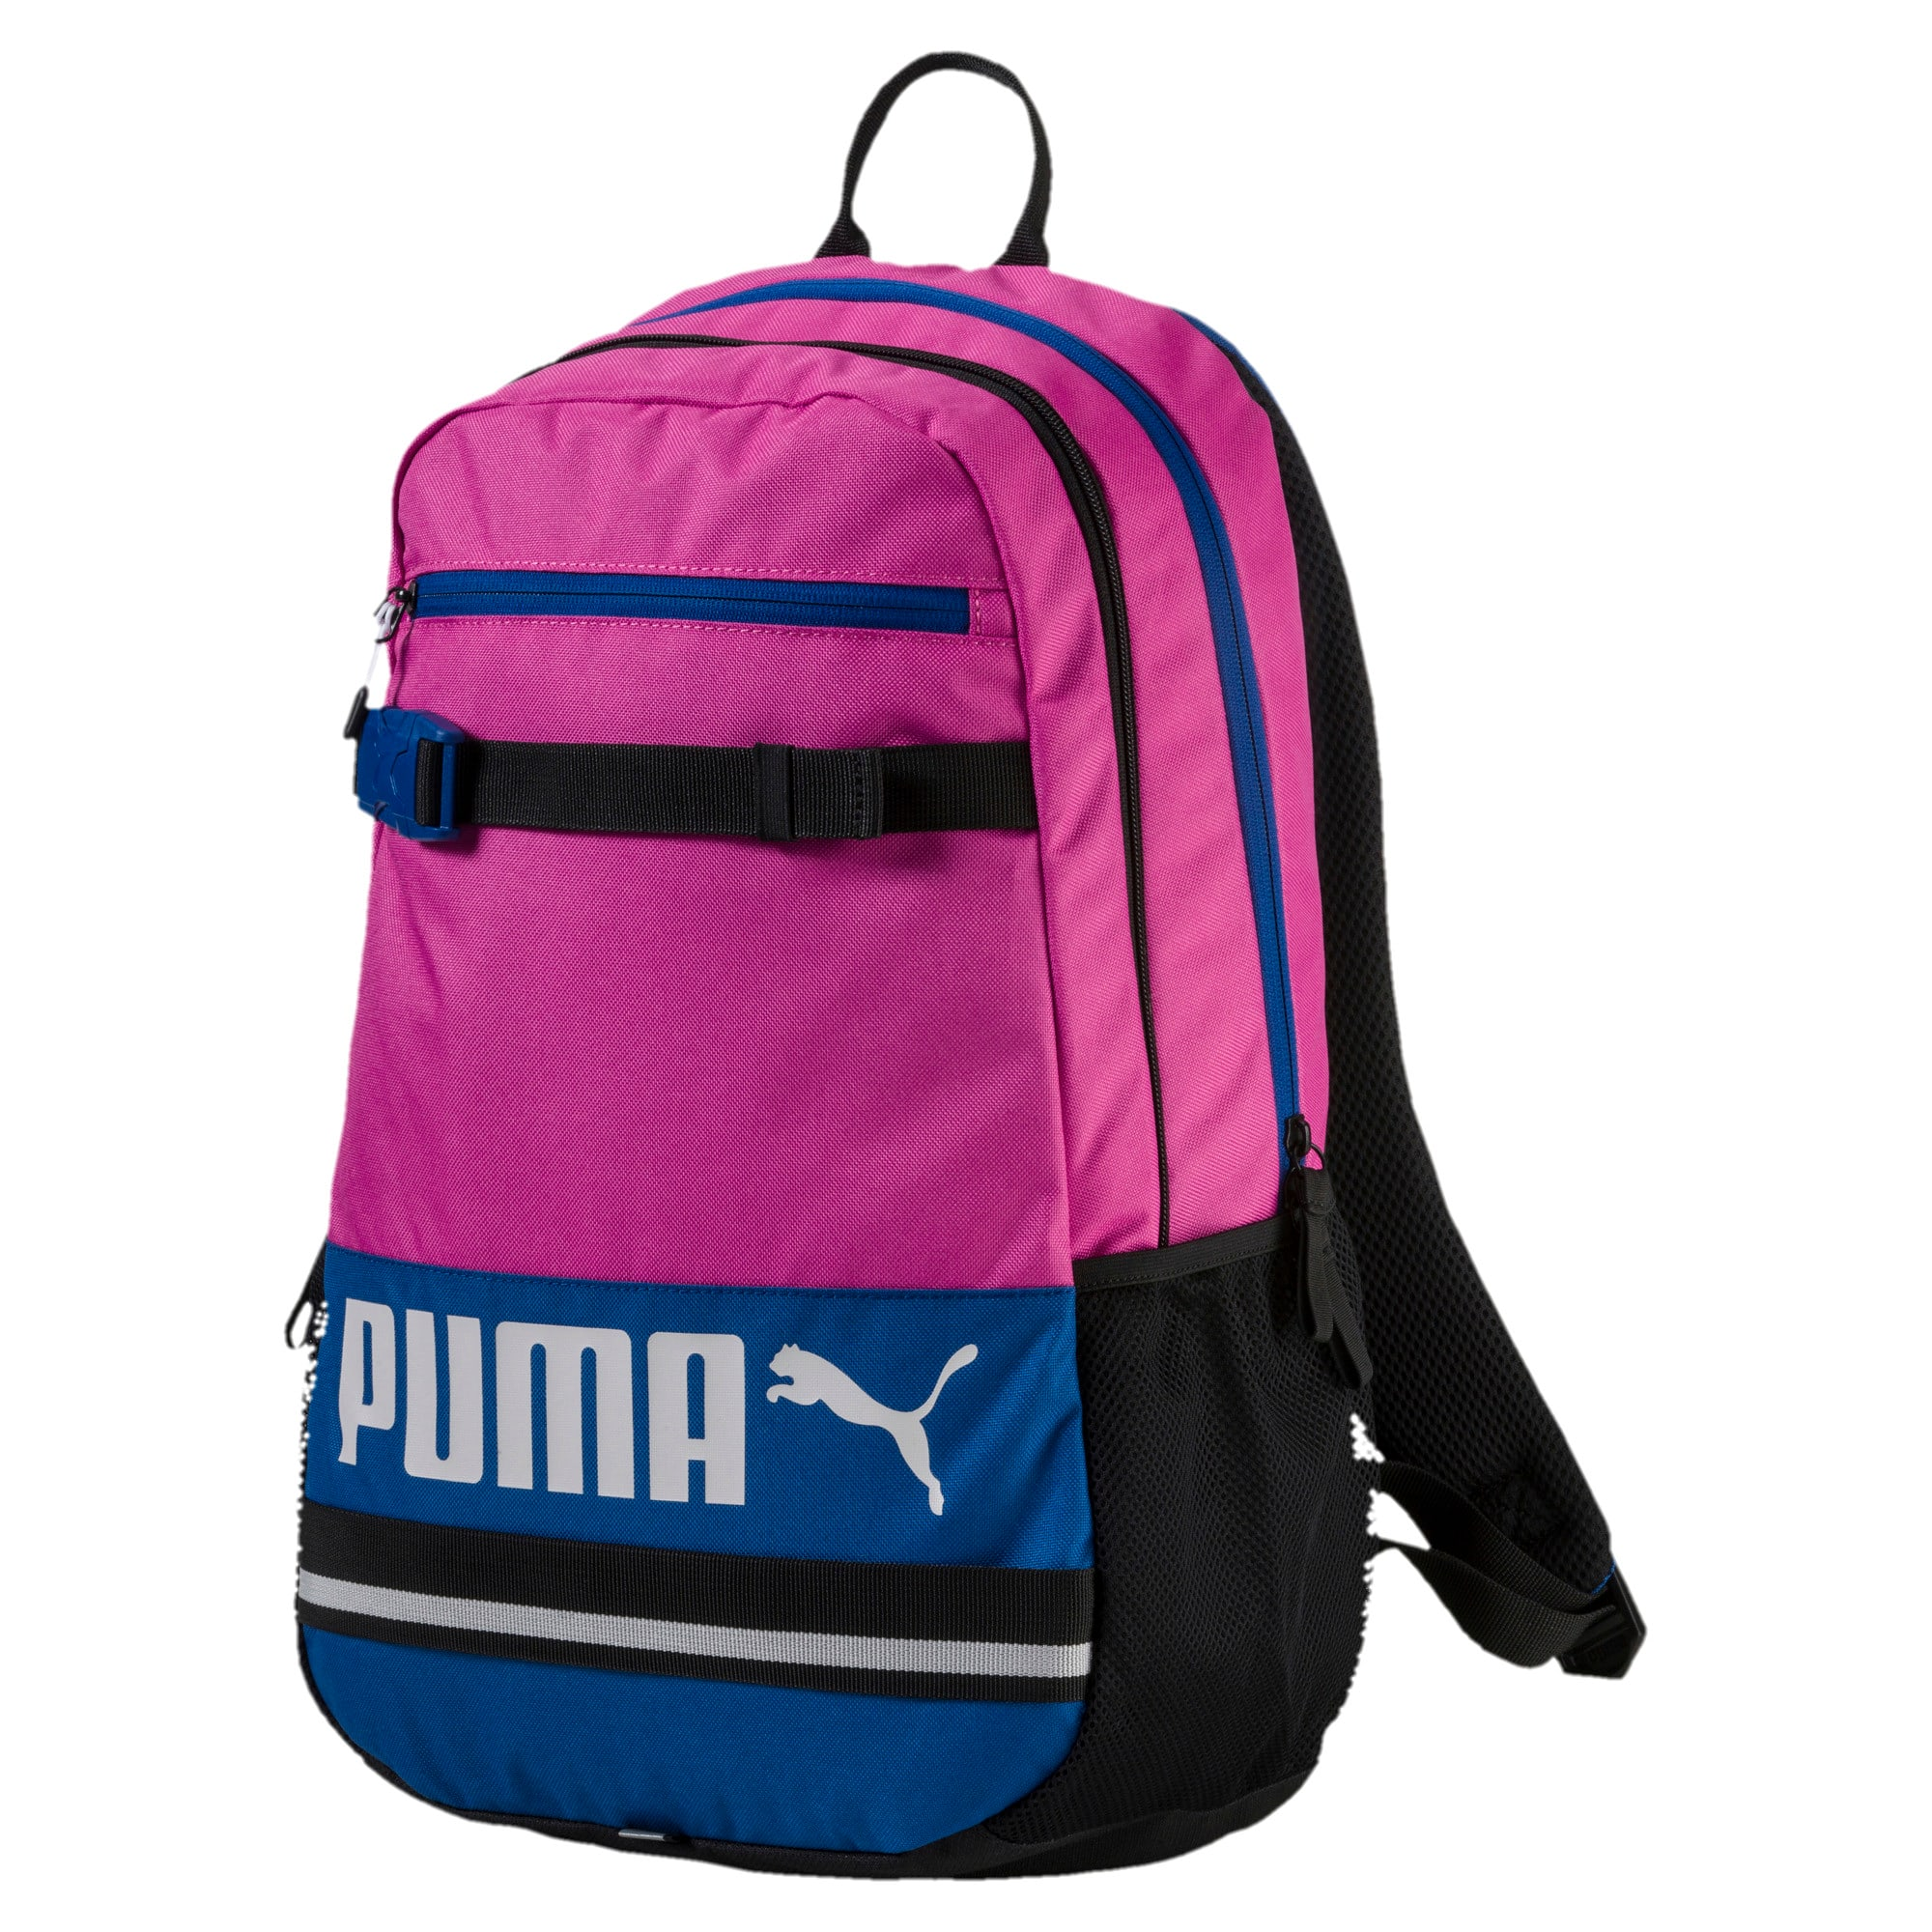 Thumbnail 1 of PUMA Deck Backpack, Rose Violet-TRUE BLUE, medium-IND